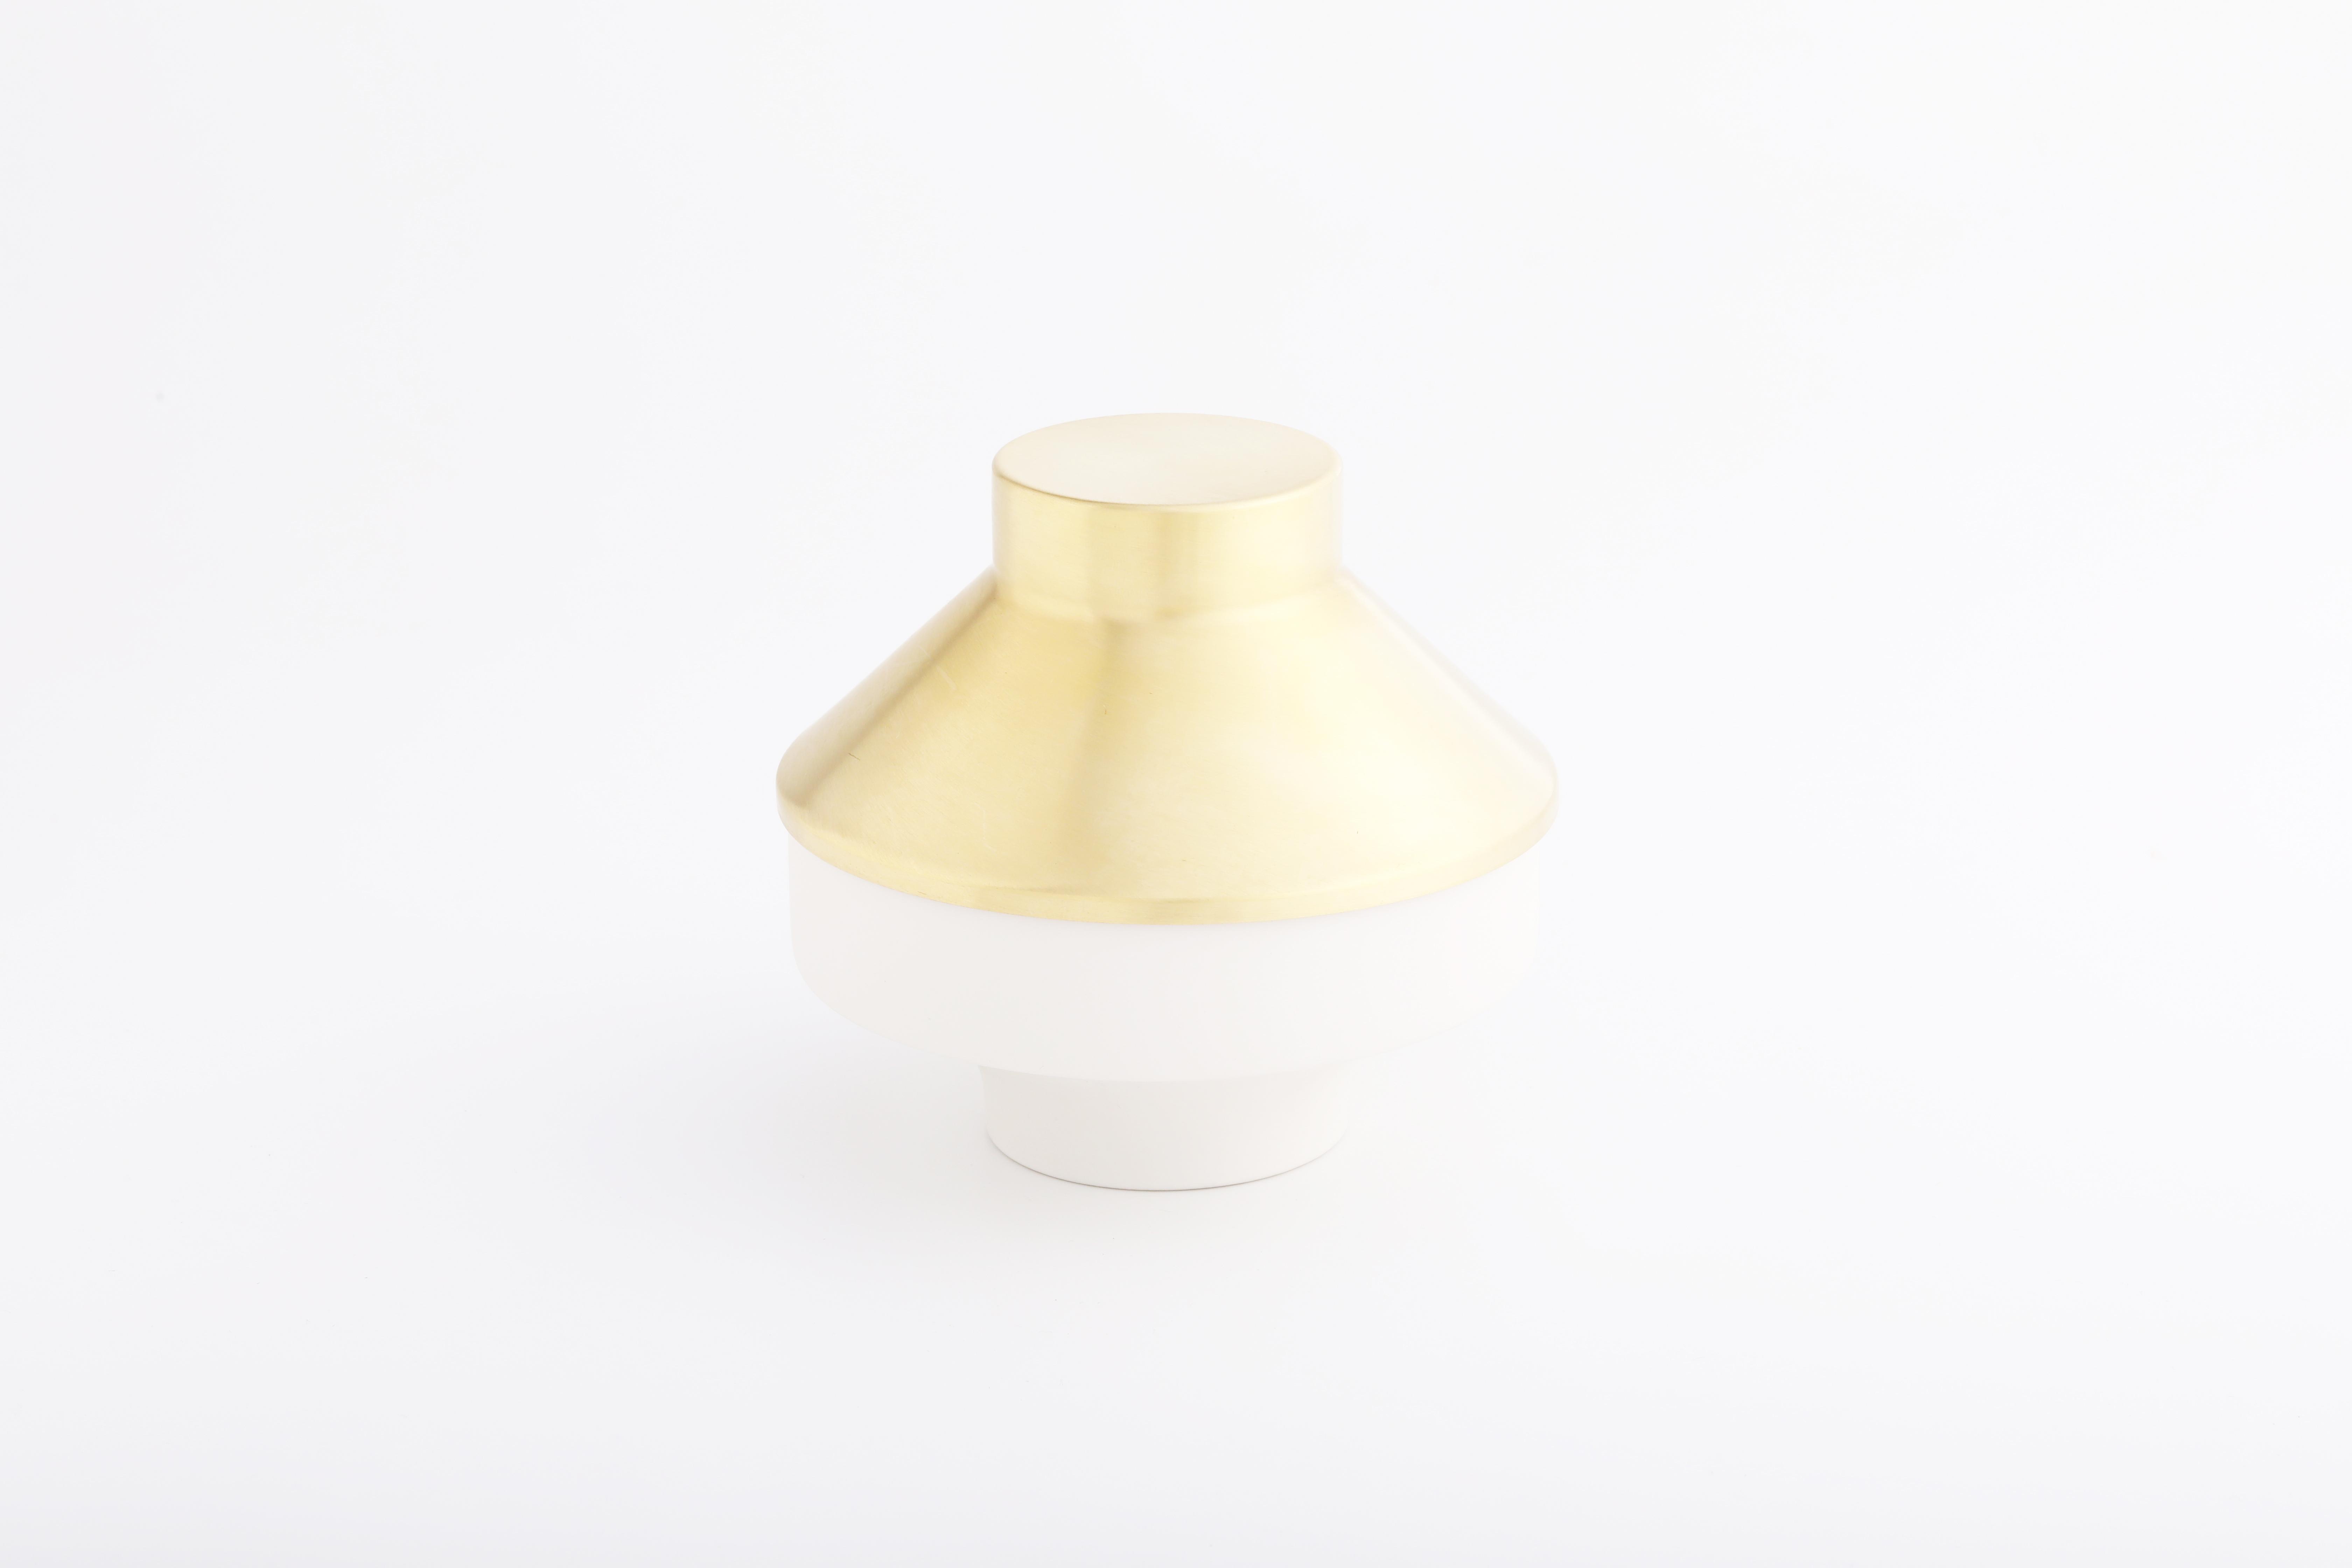 Set 7 (白瓷黃銅款 / White,Brass)